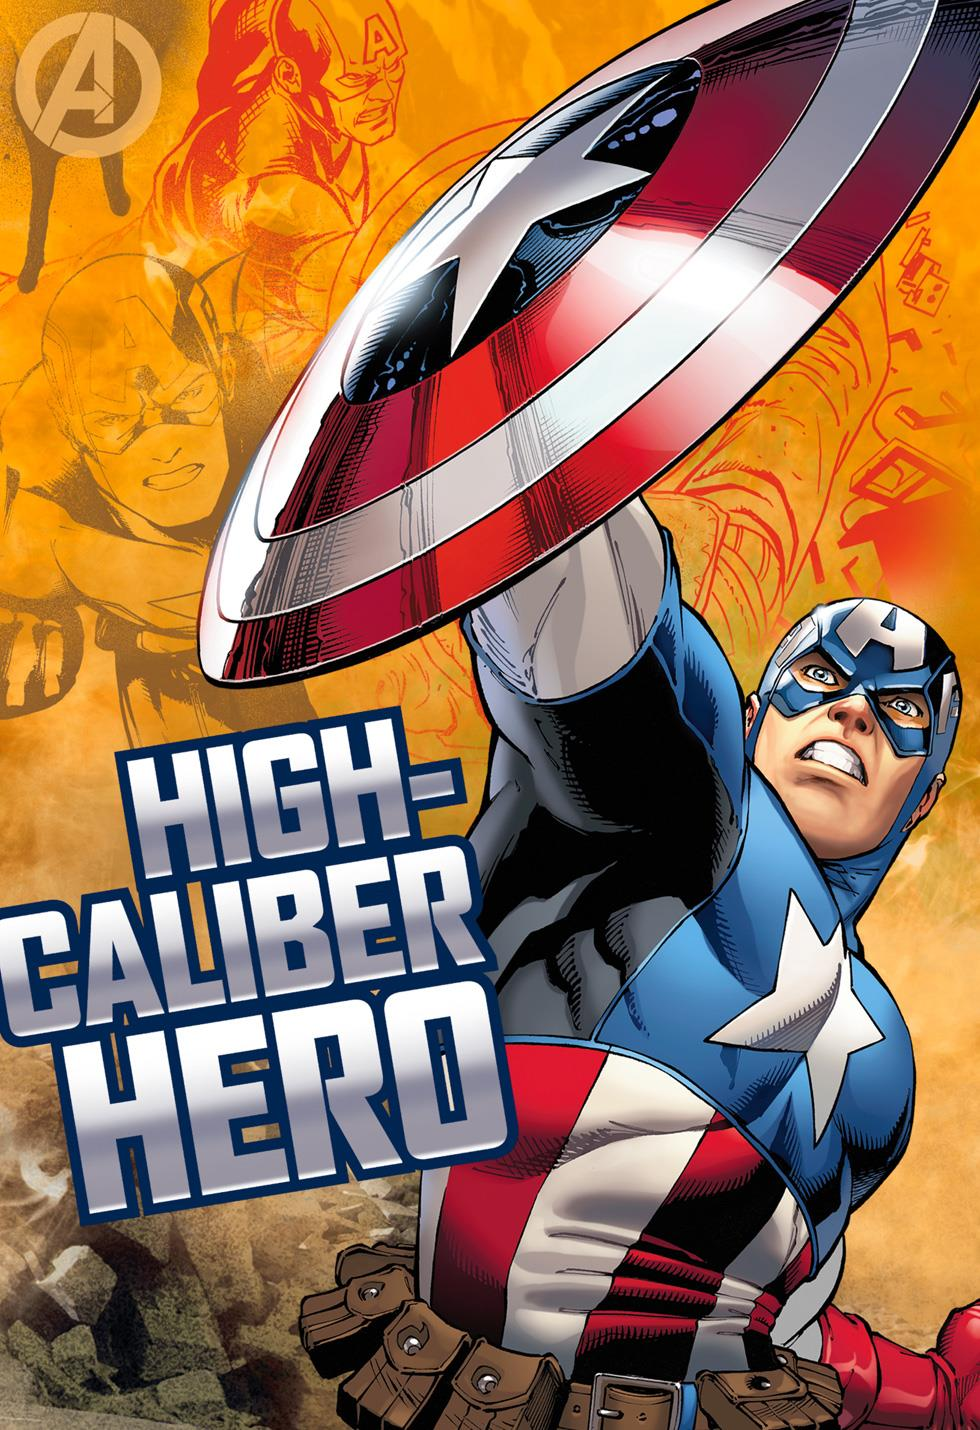 Captain america high caliber hero musical birthday card greeting captain america high caliber hero musical birthday card bookmarktalkfo Images